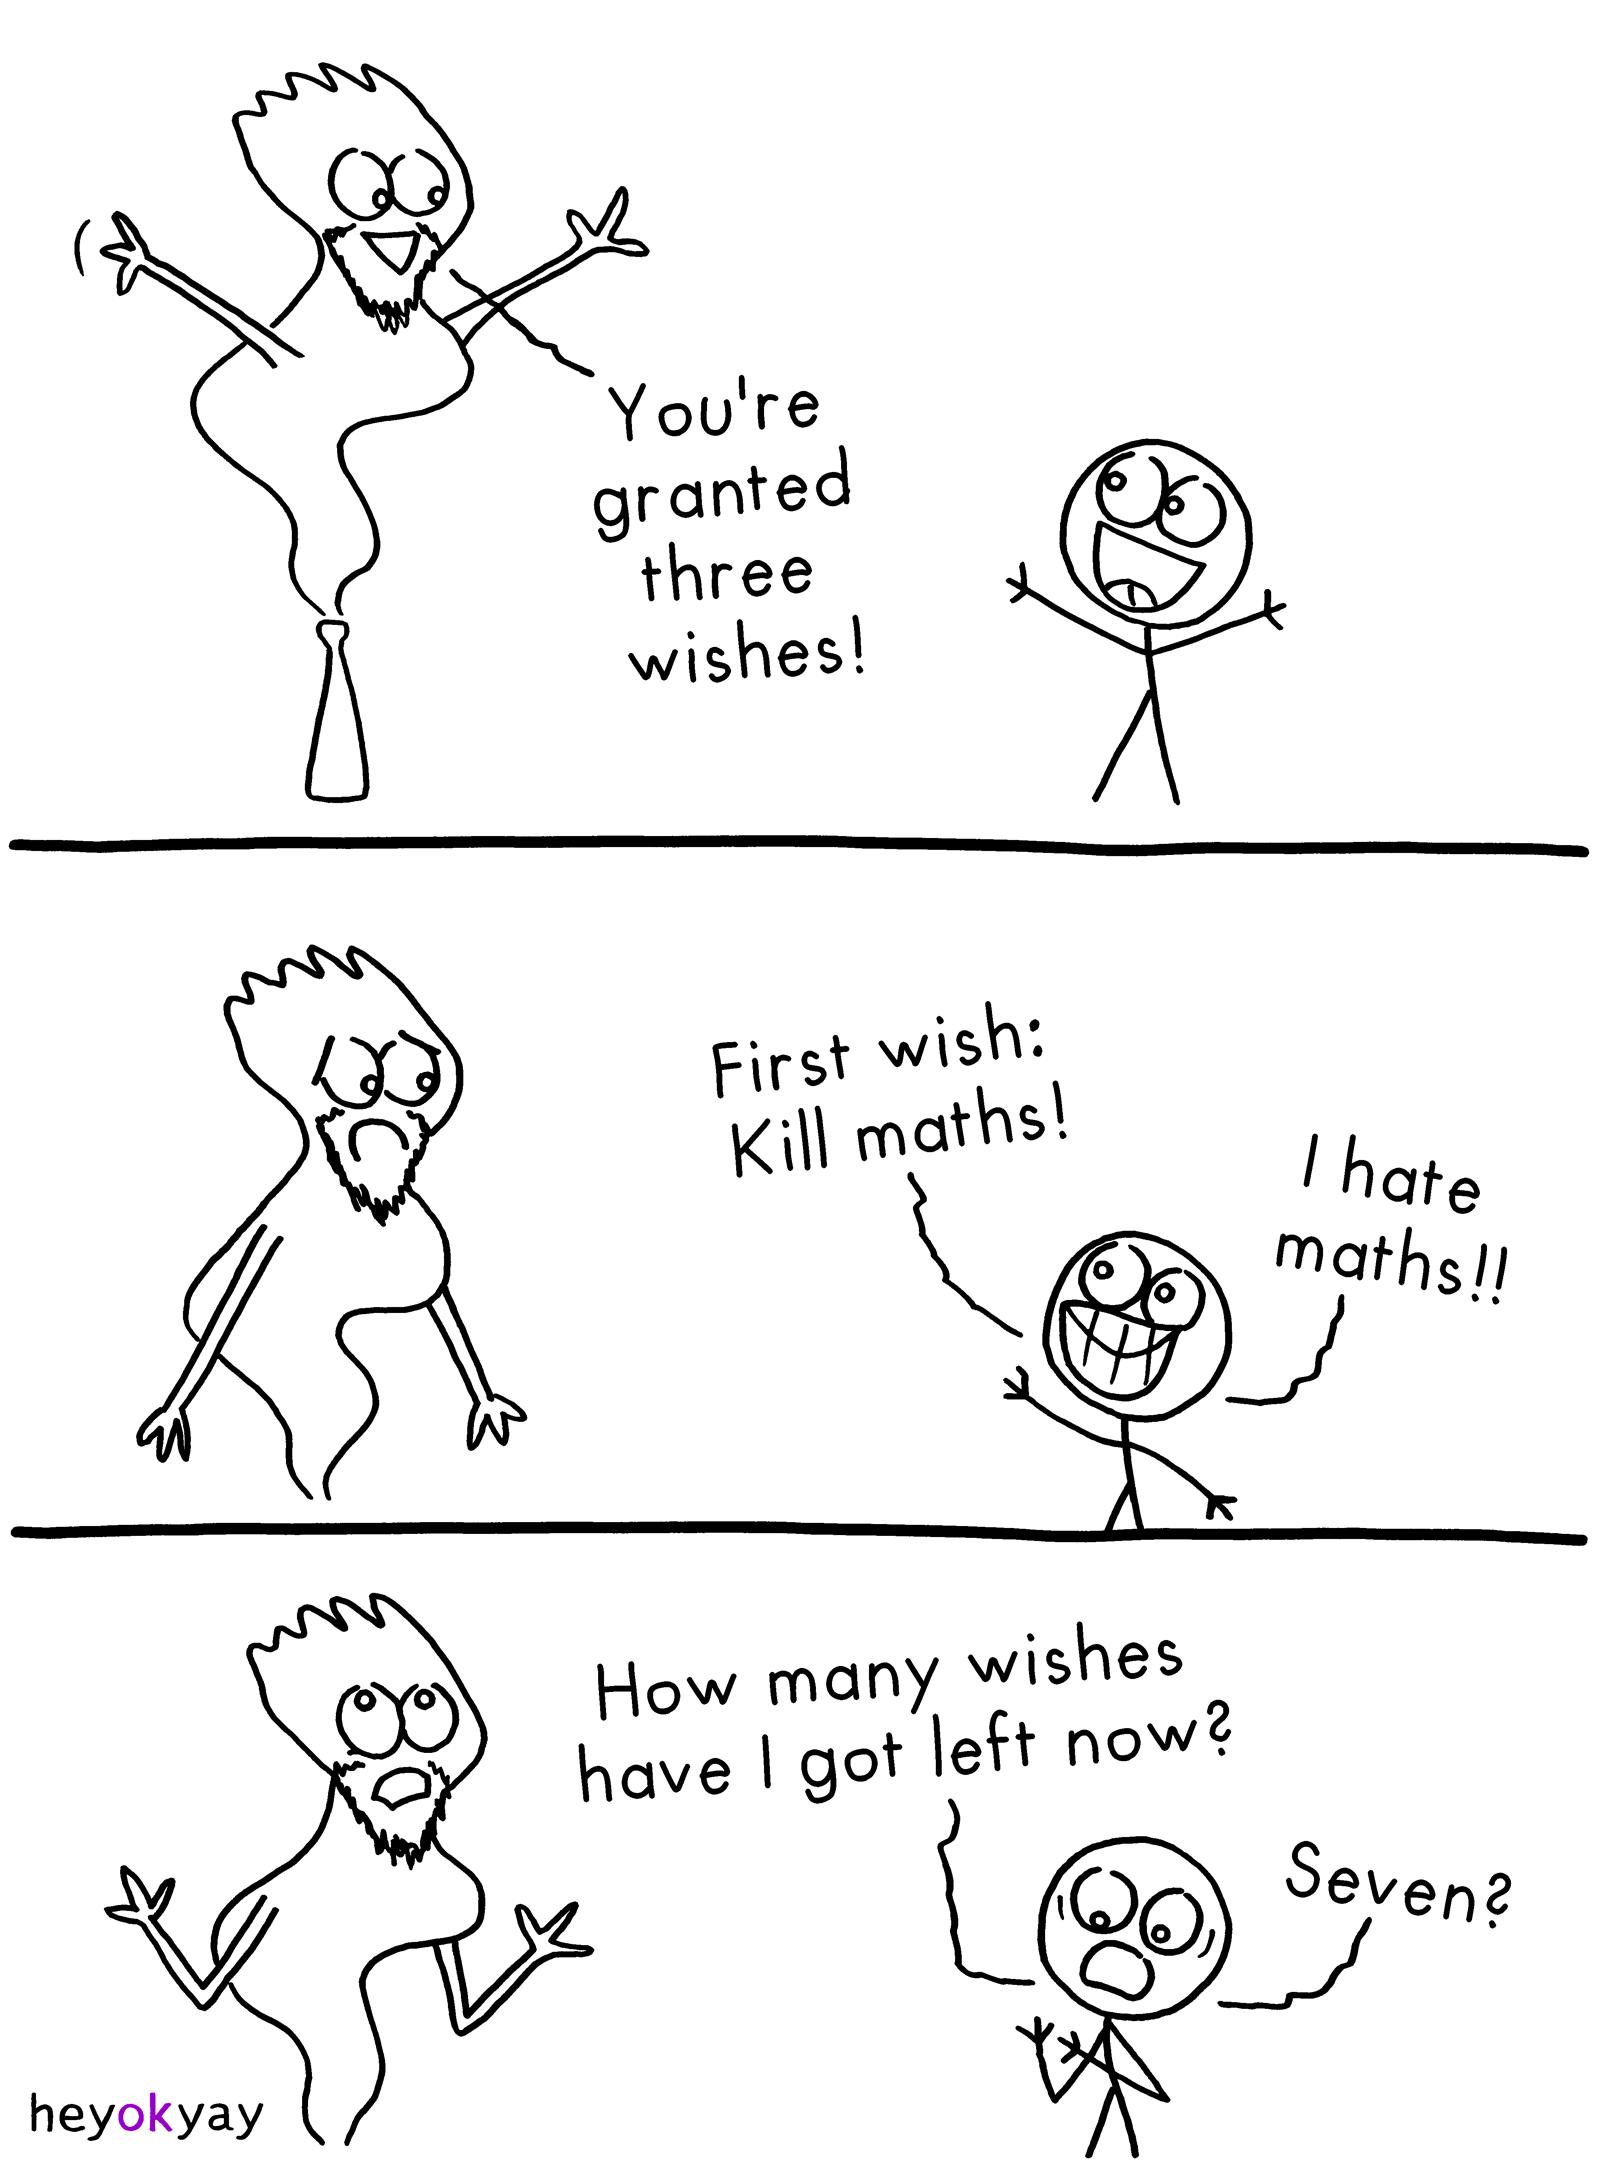 Three Wishes heyokyay comic